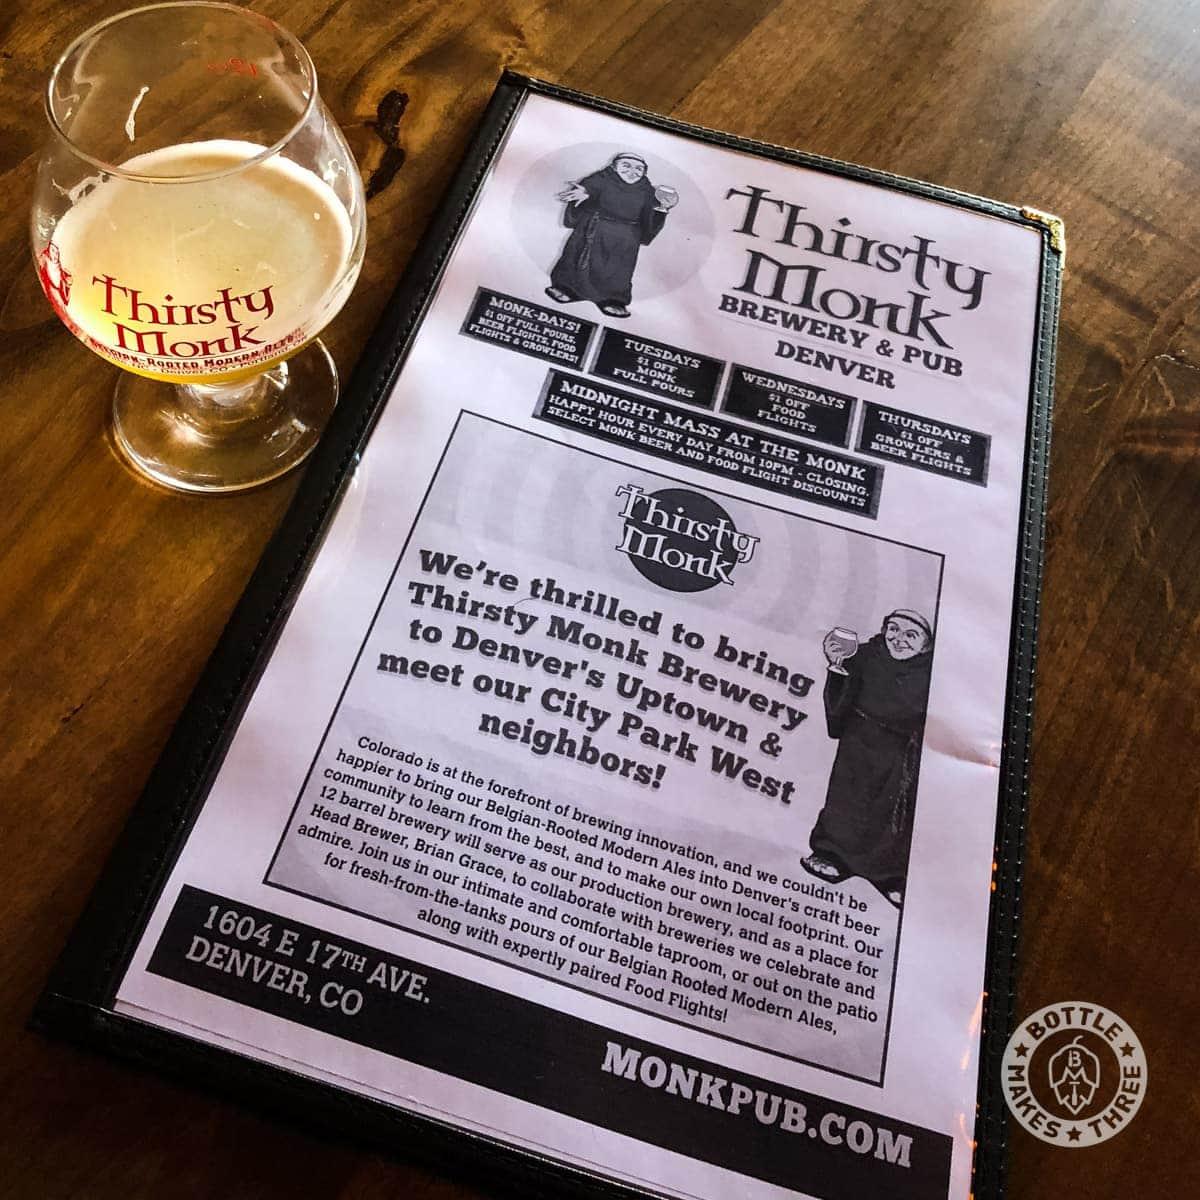 Thirsty Monk, Denver